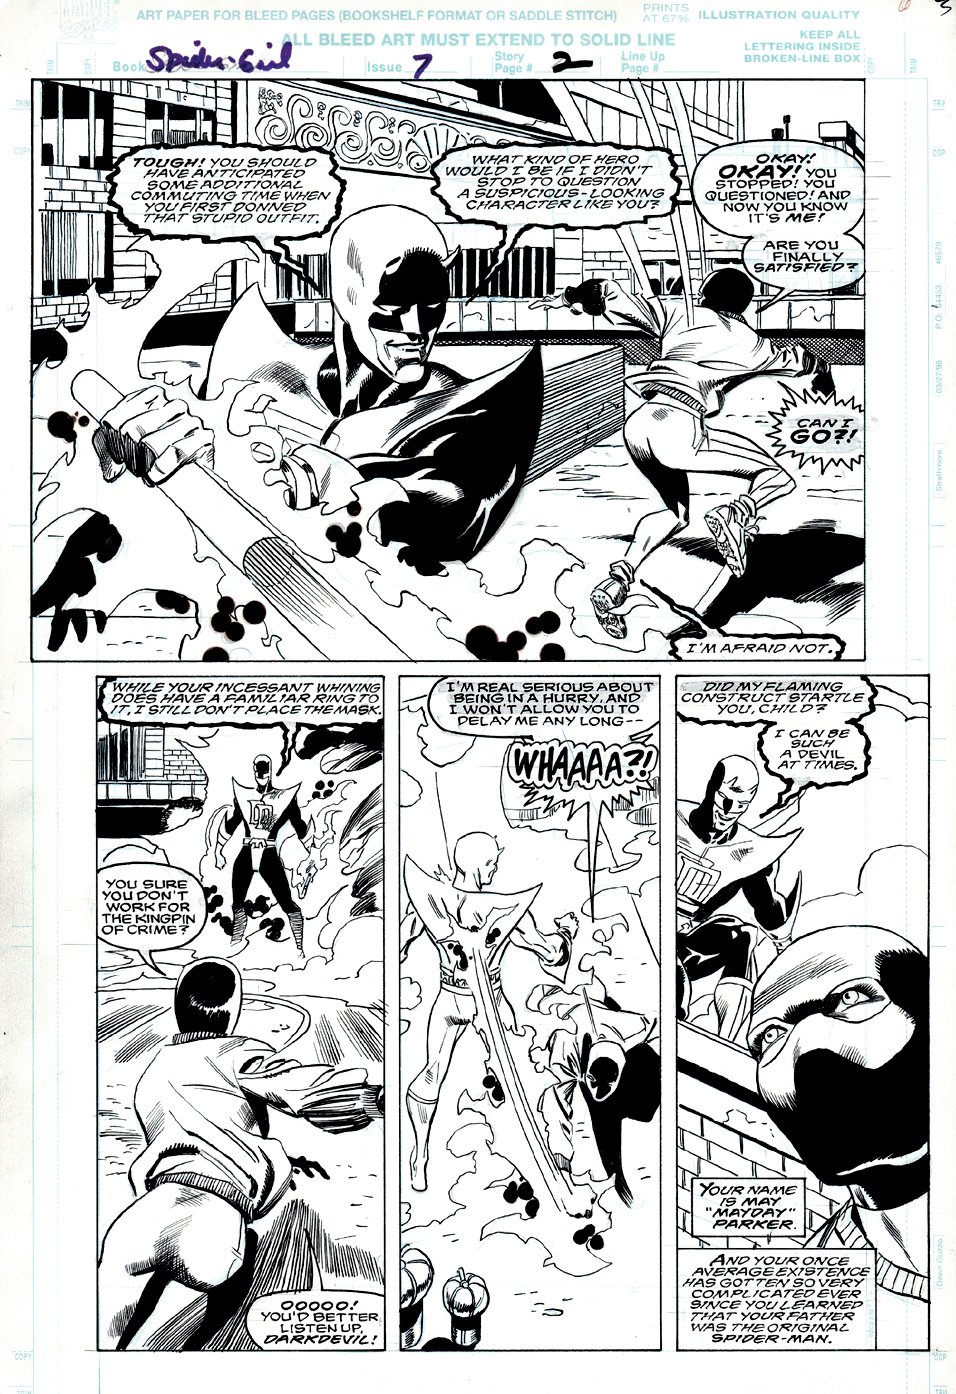 Spider-Girl #7 p 2 Semi-Splash (Spider-Girl Battles Darkdevil!) 1998